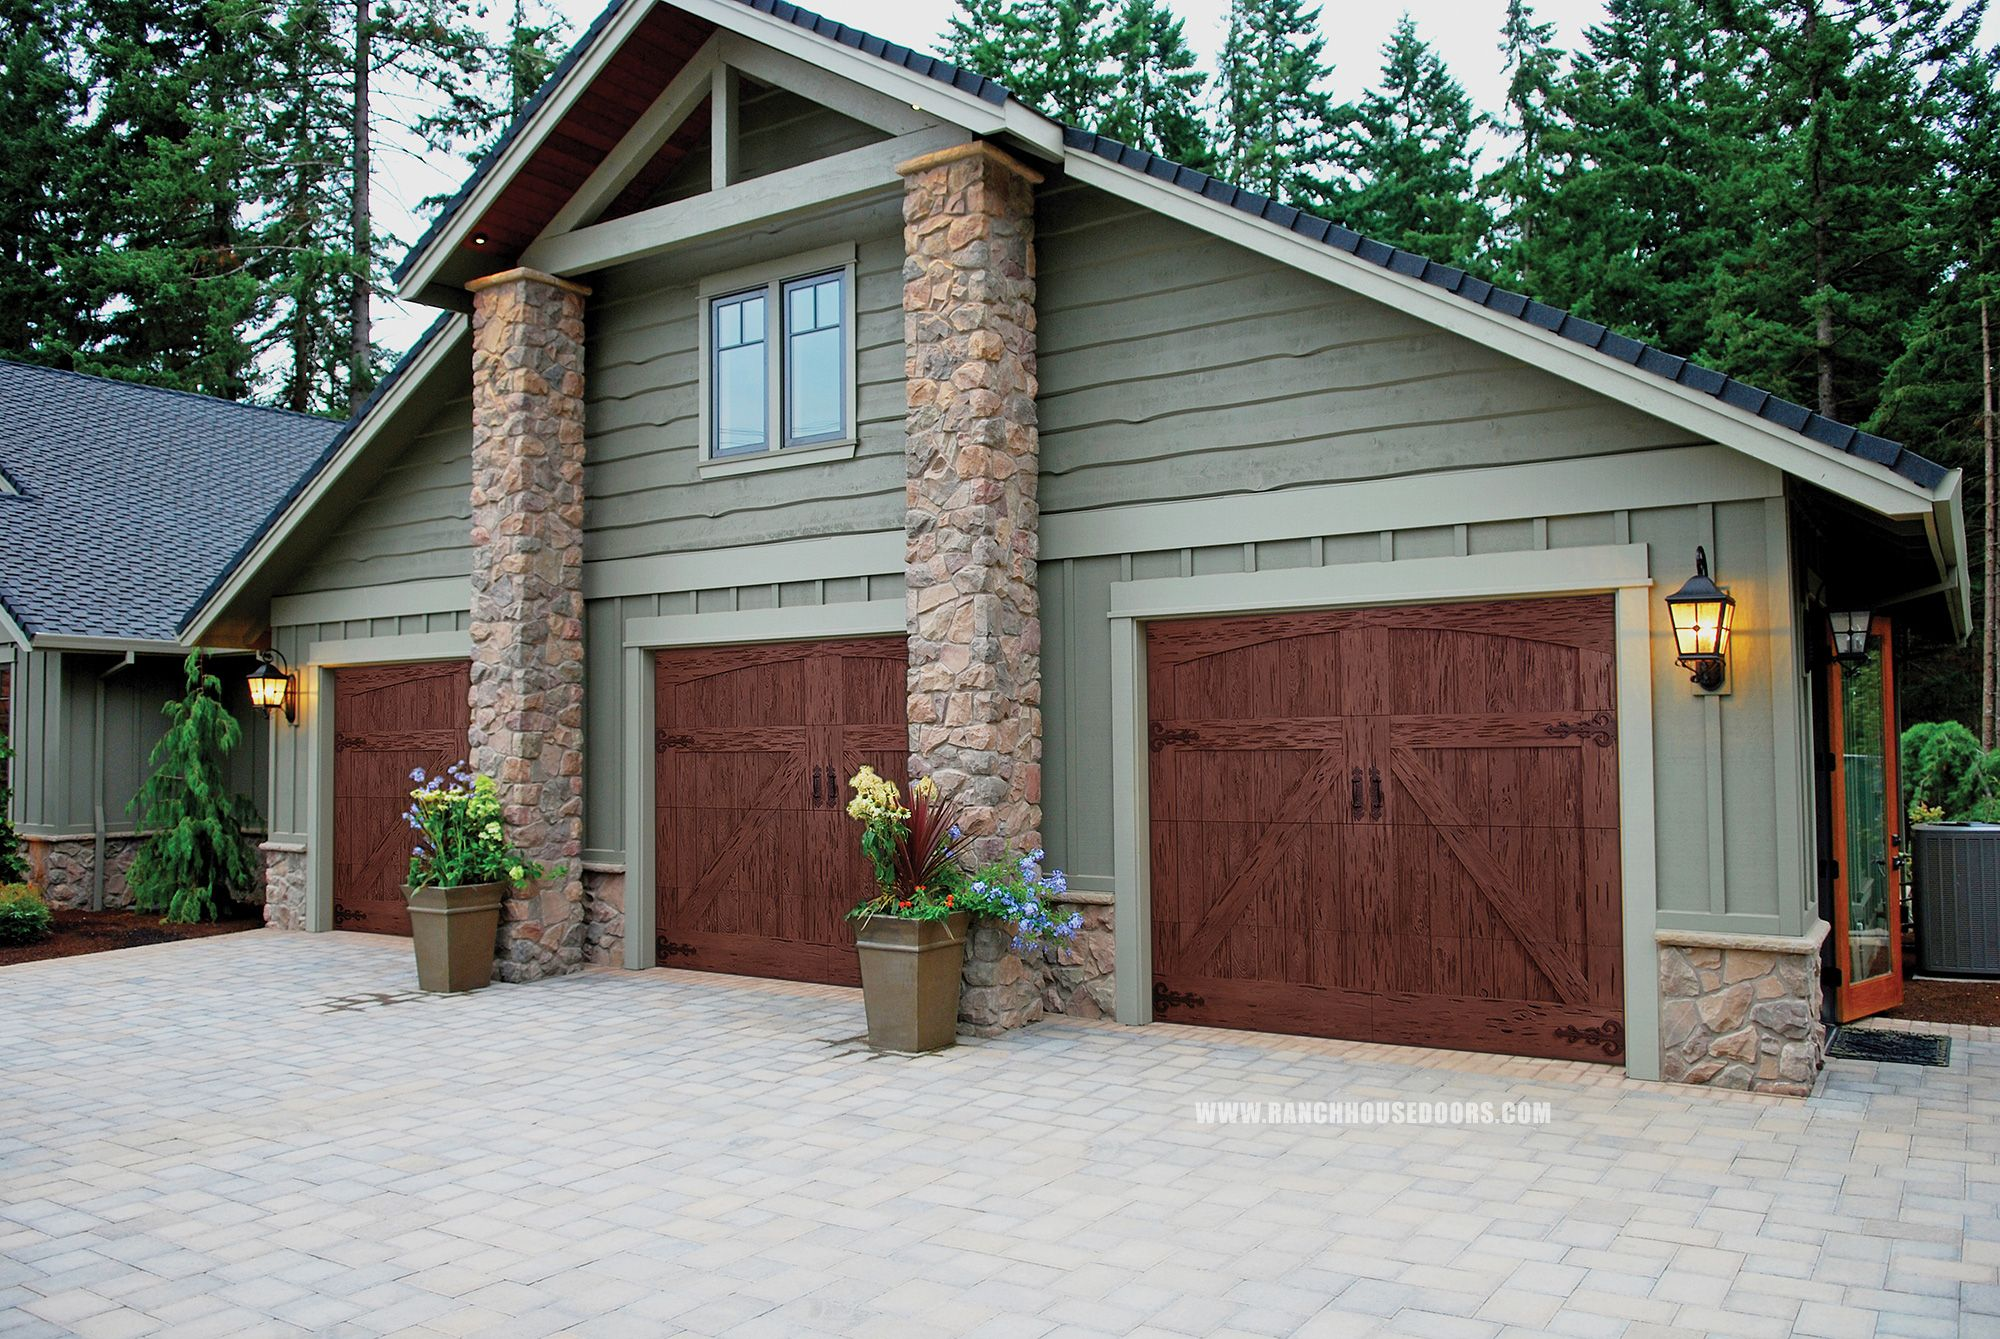 Garage Garage Springs Side Hinged Garage Doors Prices Garage Garage Door Design Wooden Garage Doors House Paint Exterior